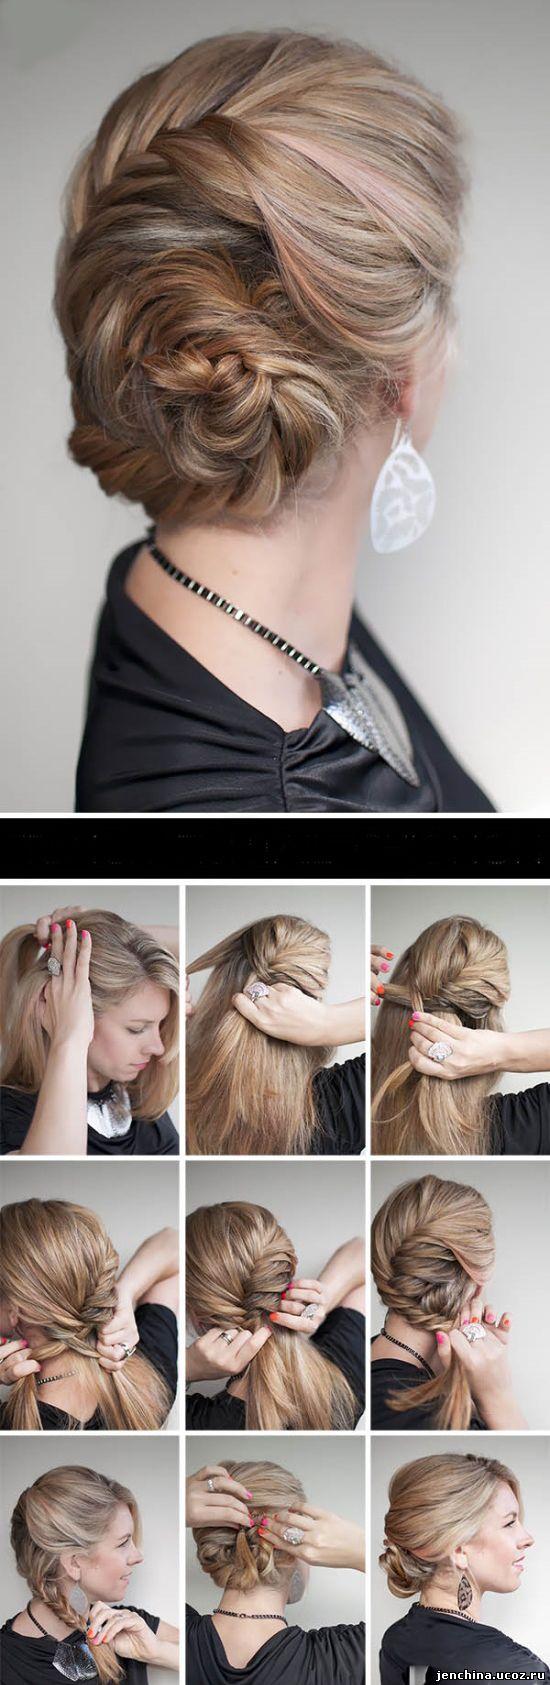 Причёски на своими руками на средние волосы фото пошагово